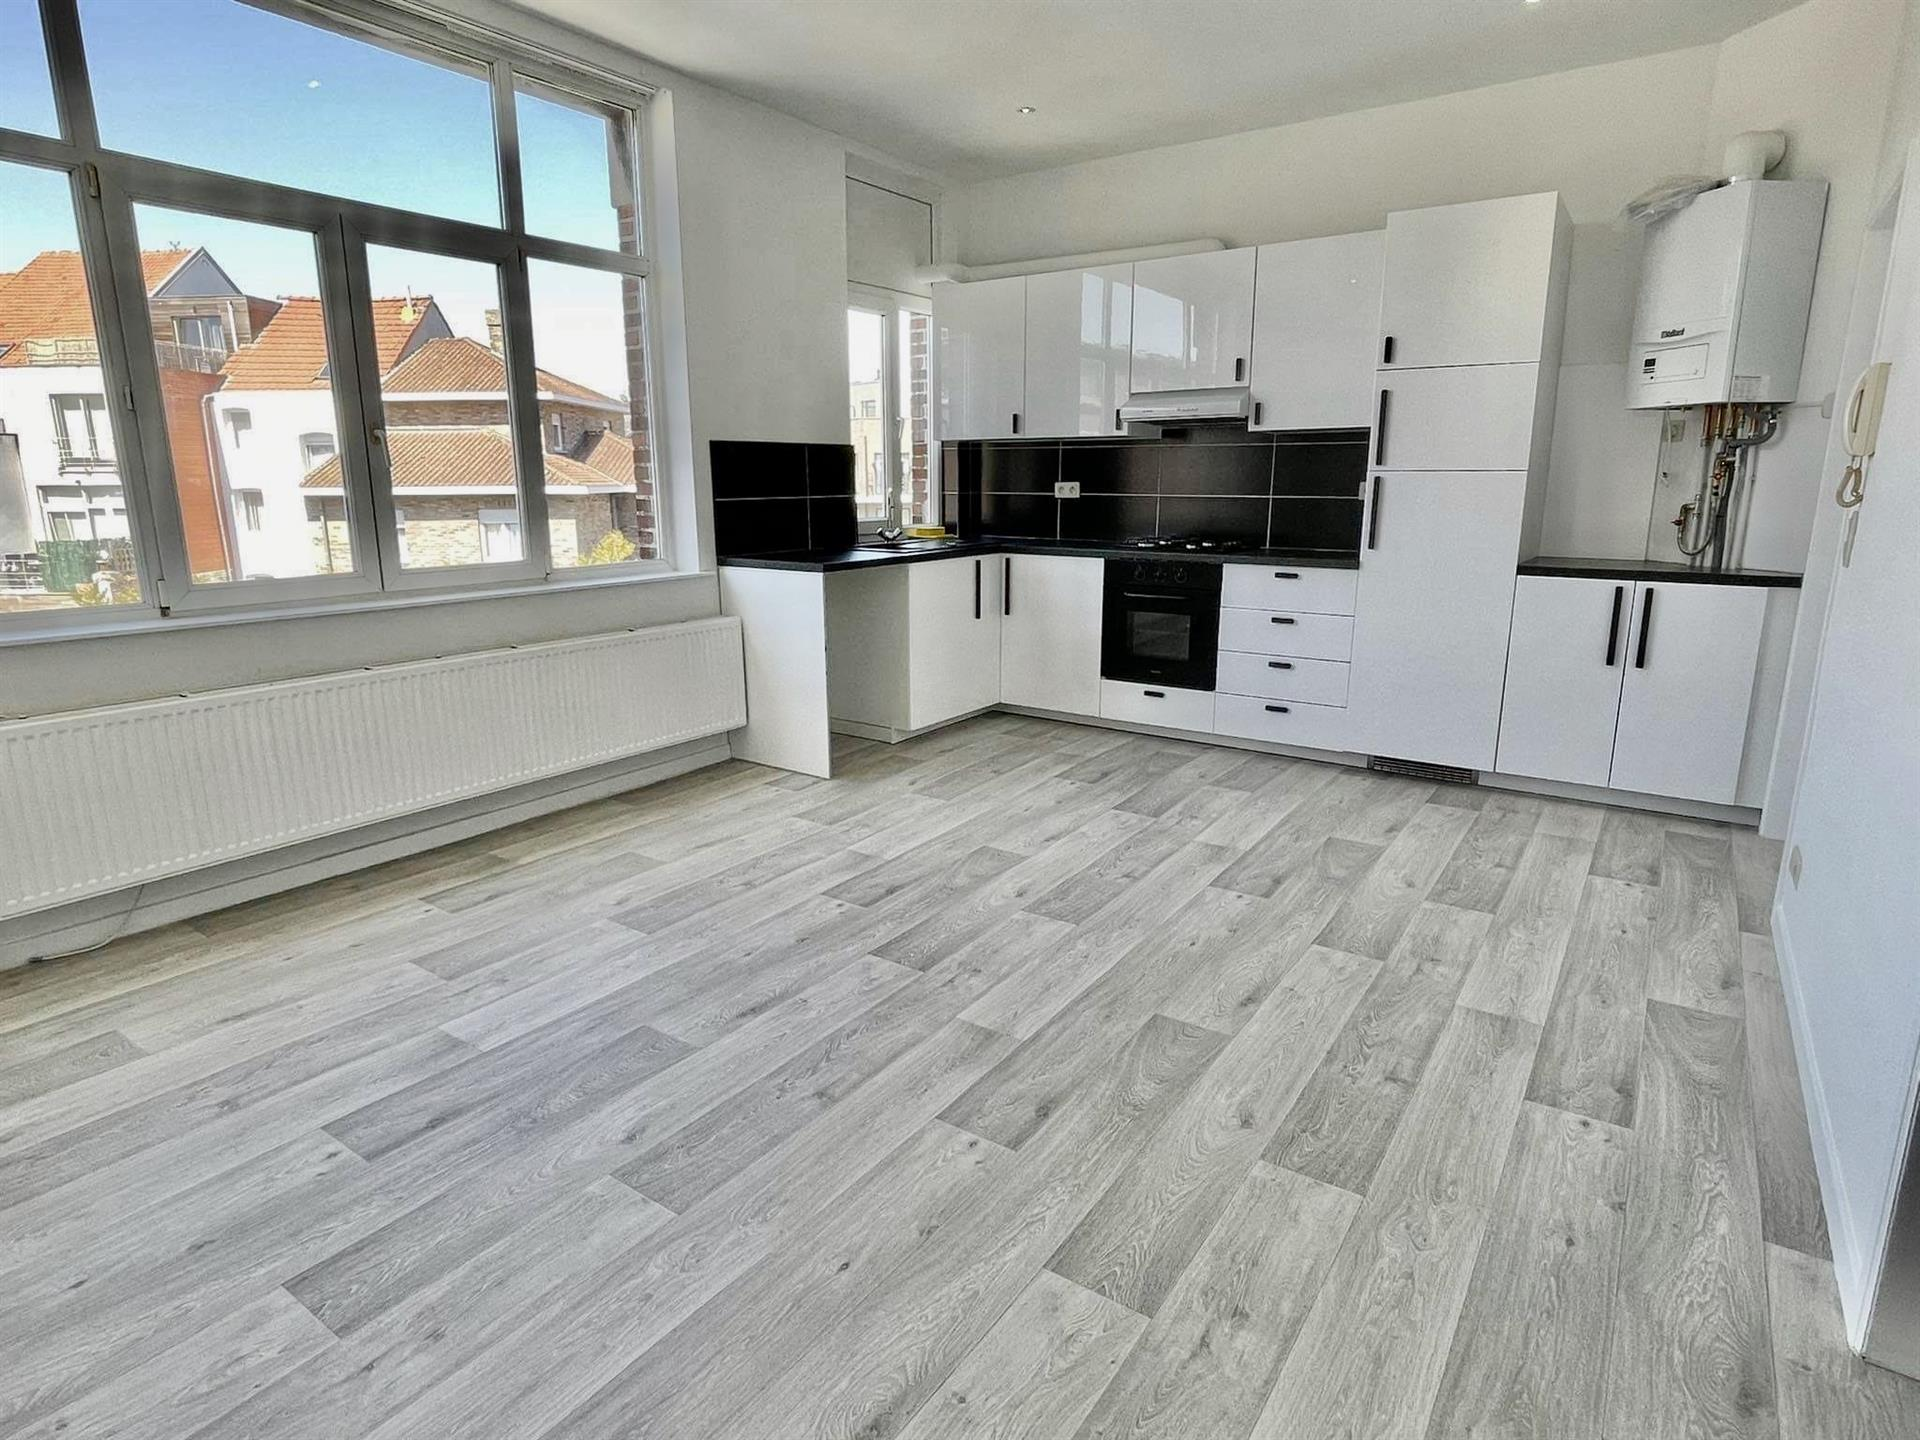 Appartement - Molenbeek-Saint-Jean - #4343762-1